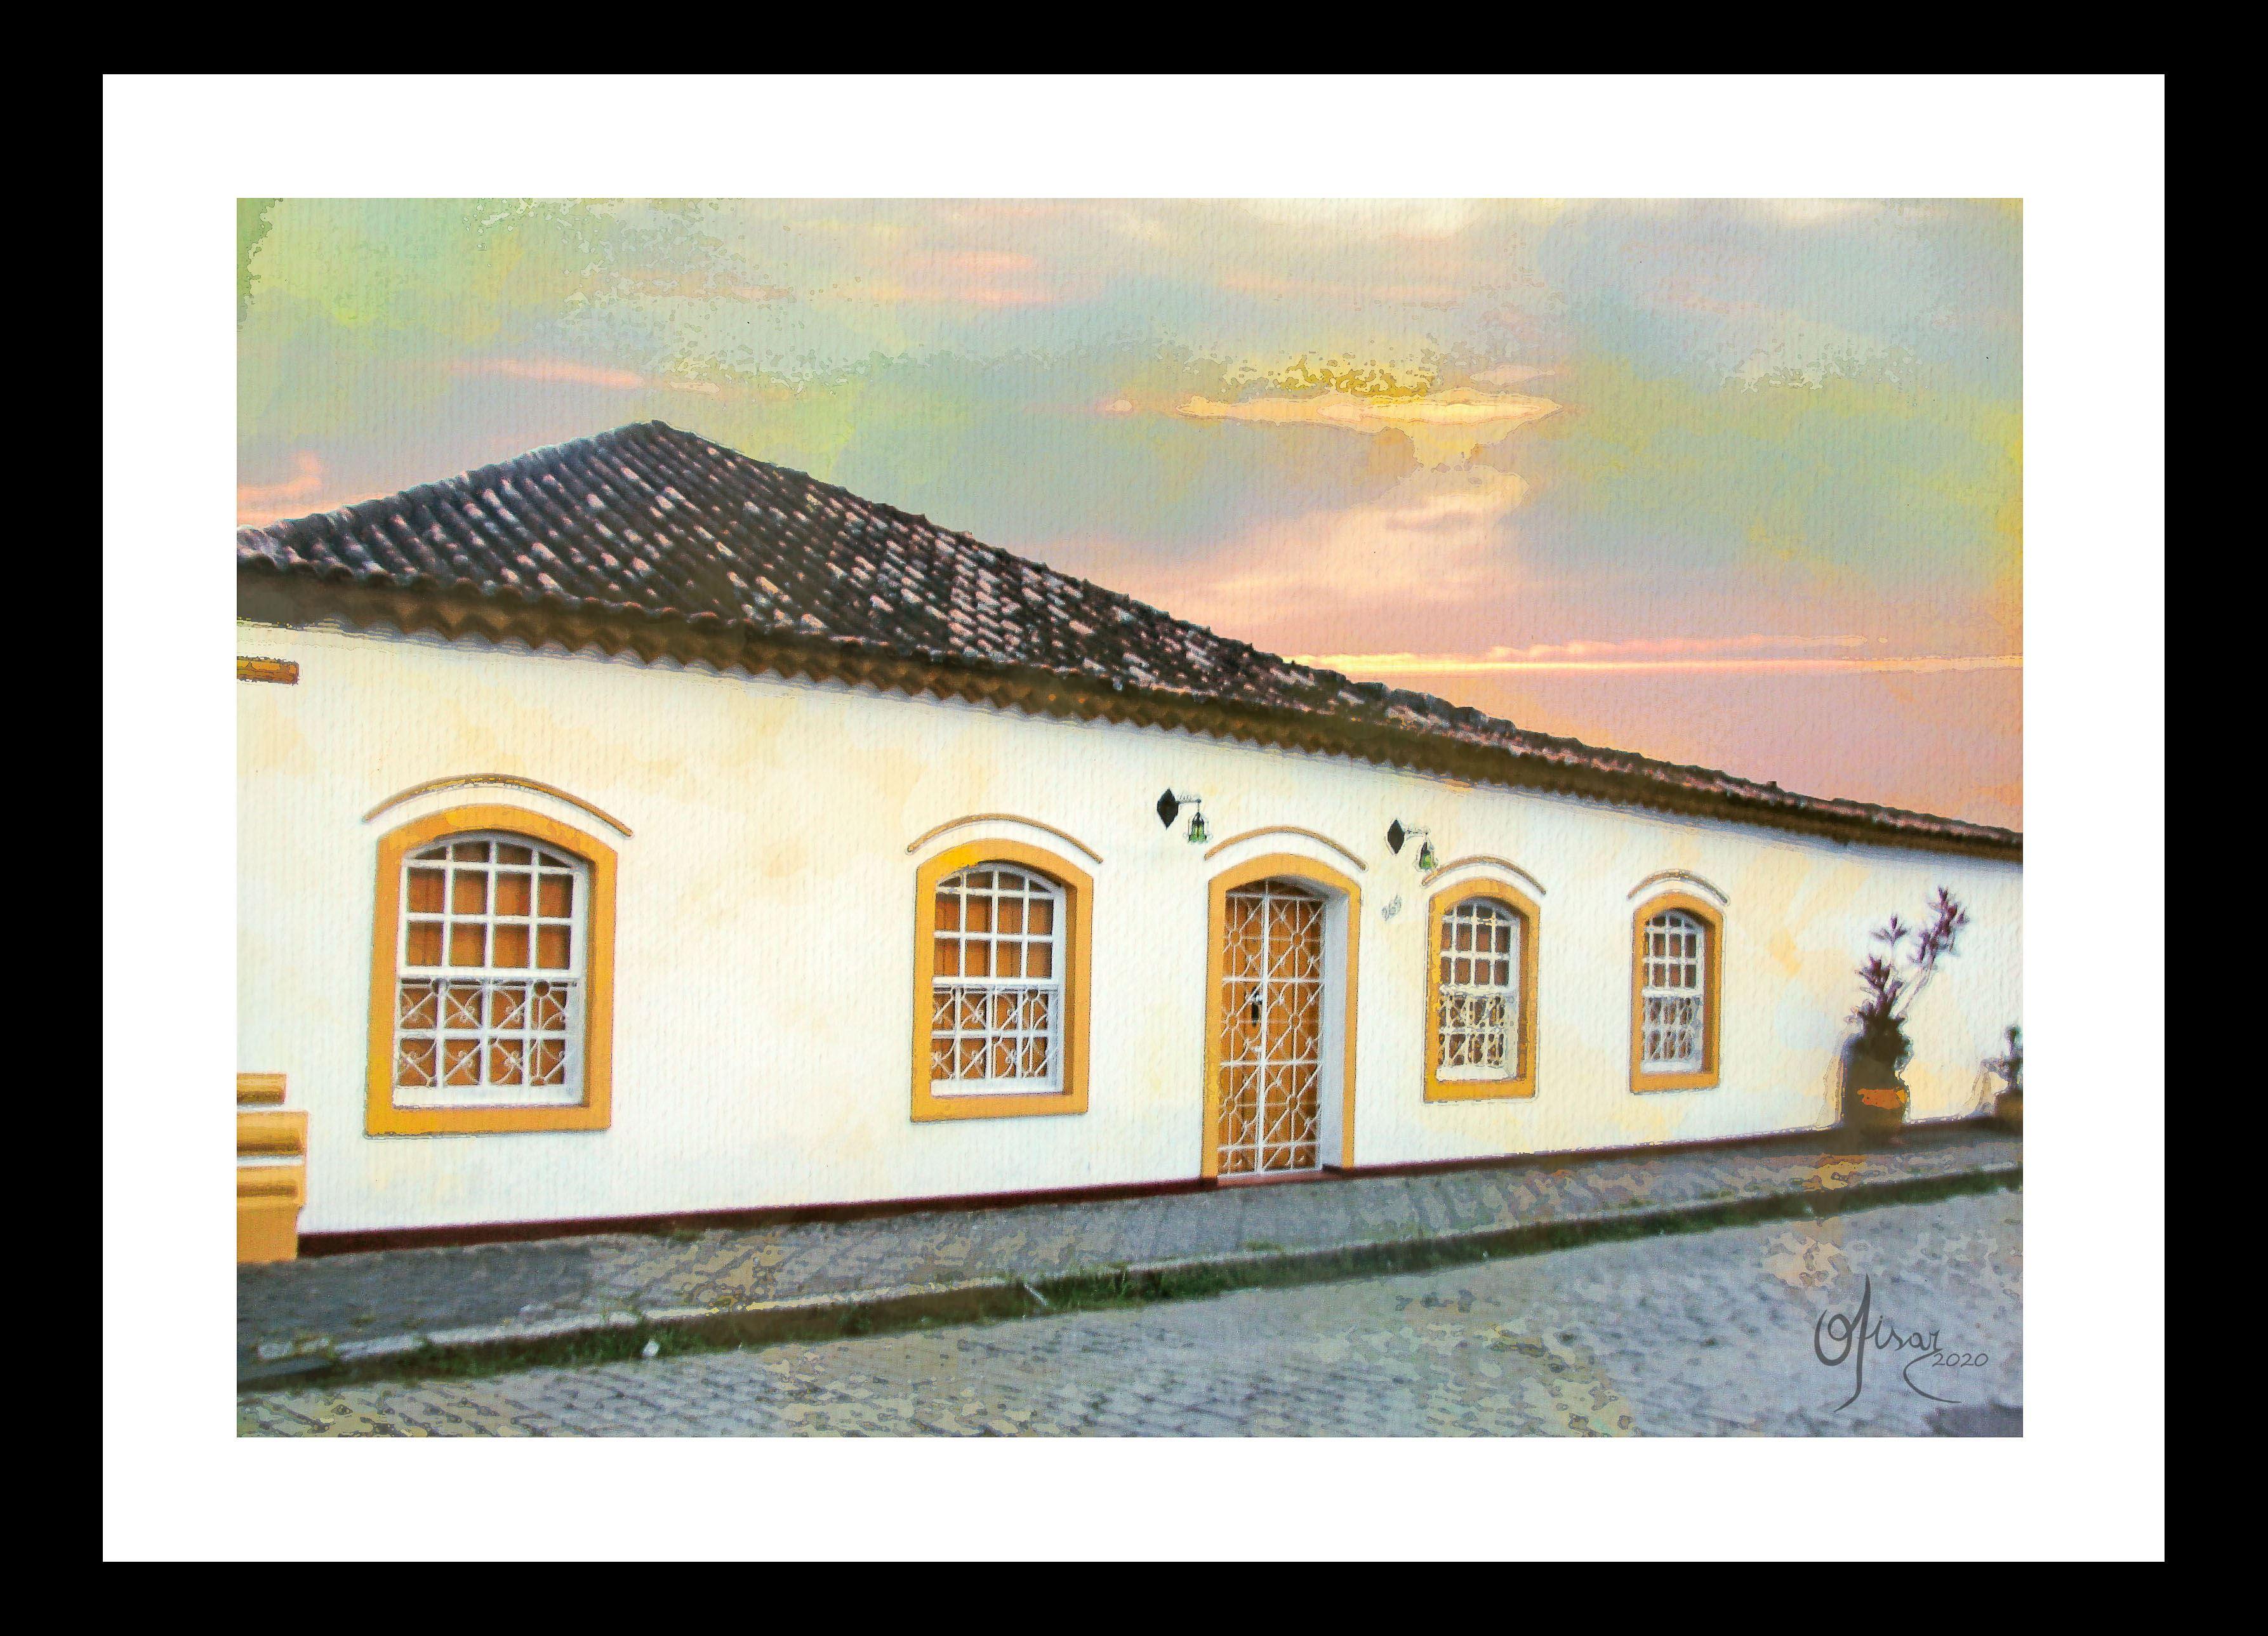 Foto 1 - GRAVURAS E OUTROS BICHOS - THELMO OLISAR